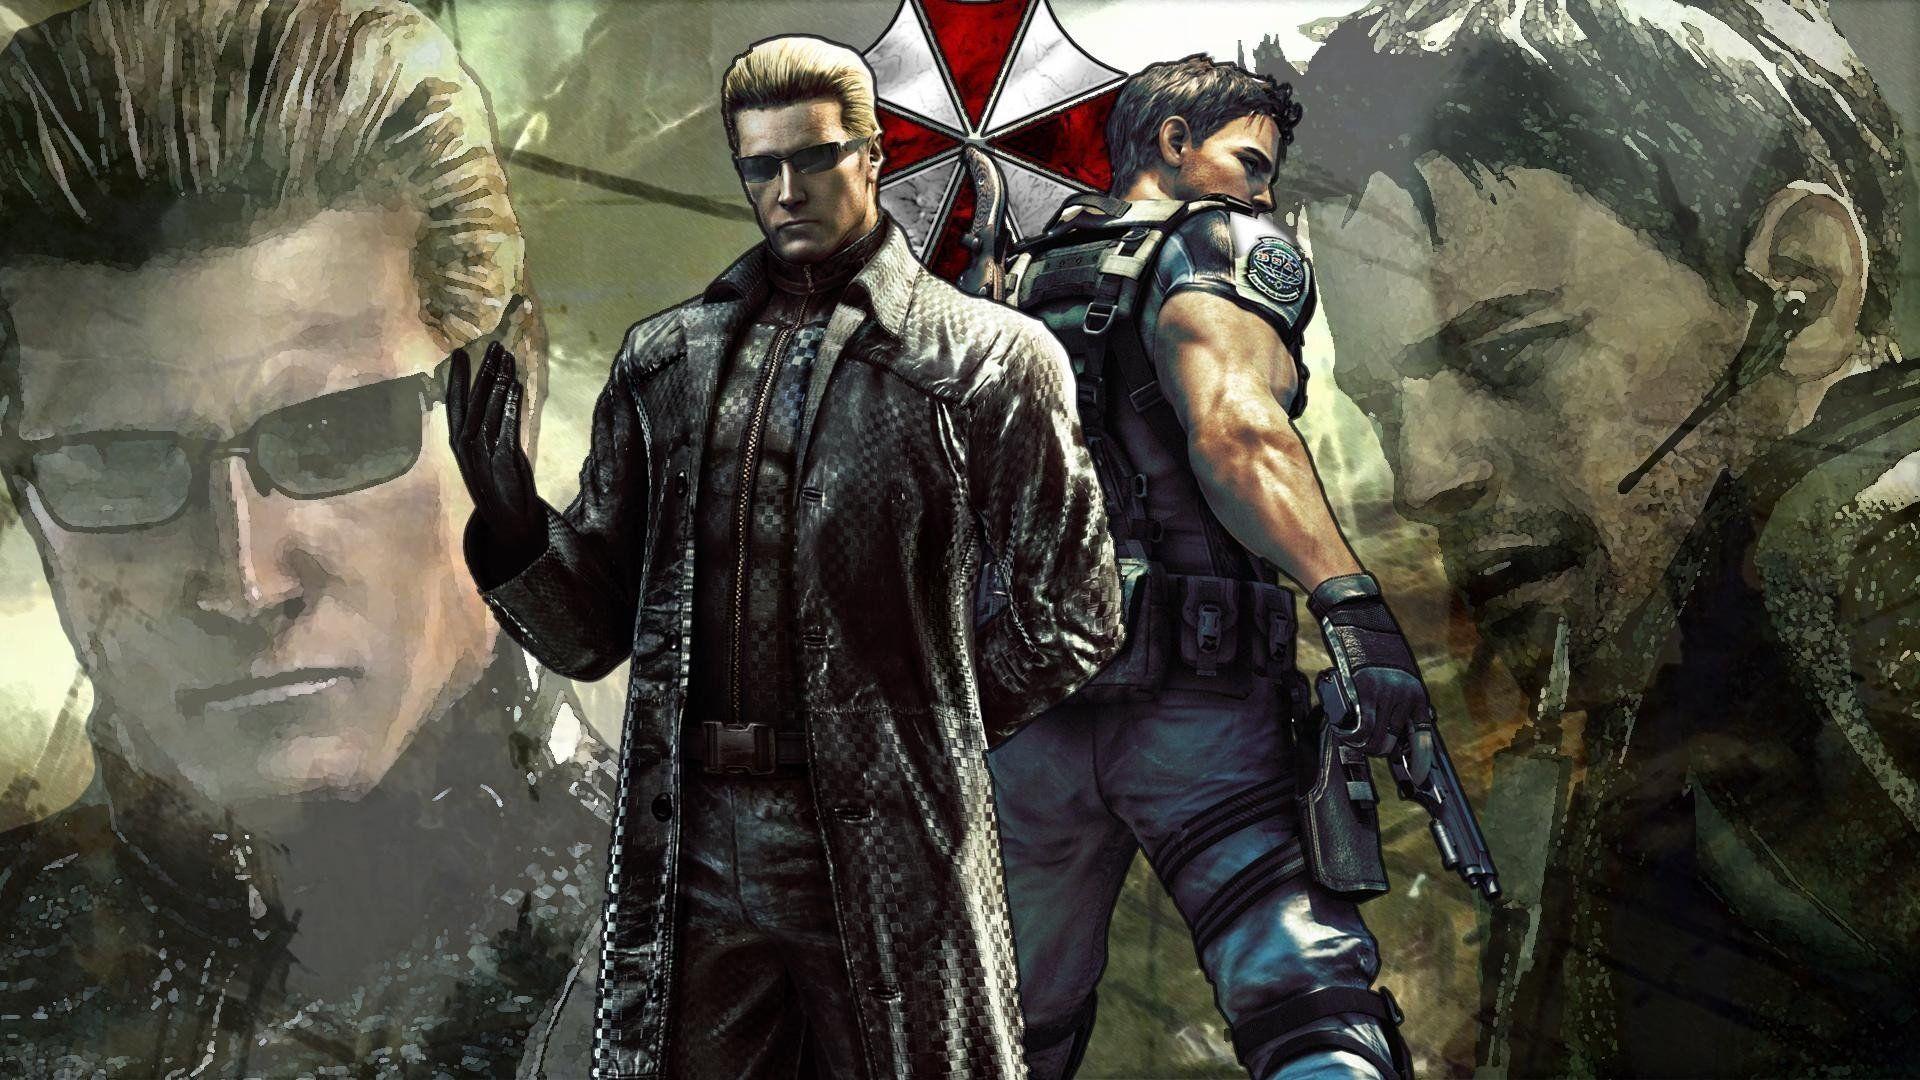 Resident Evil Wallpapers Hd Wallpaper